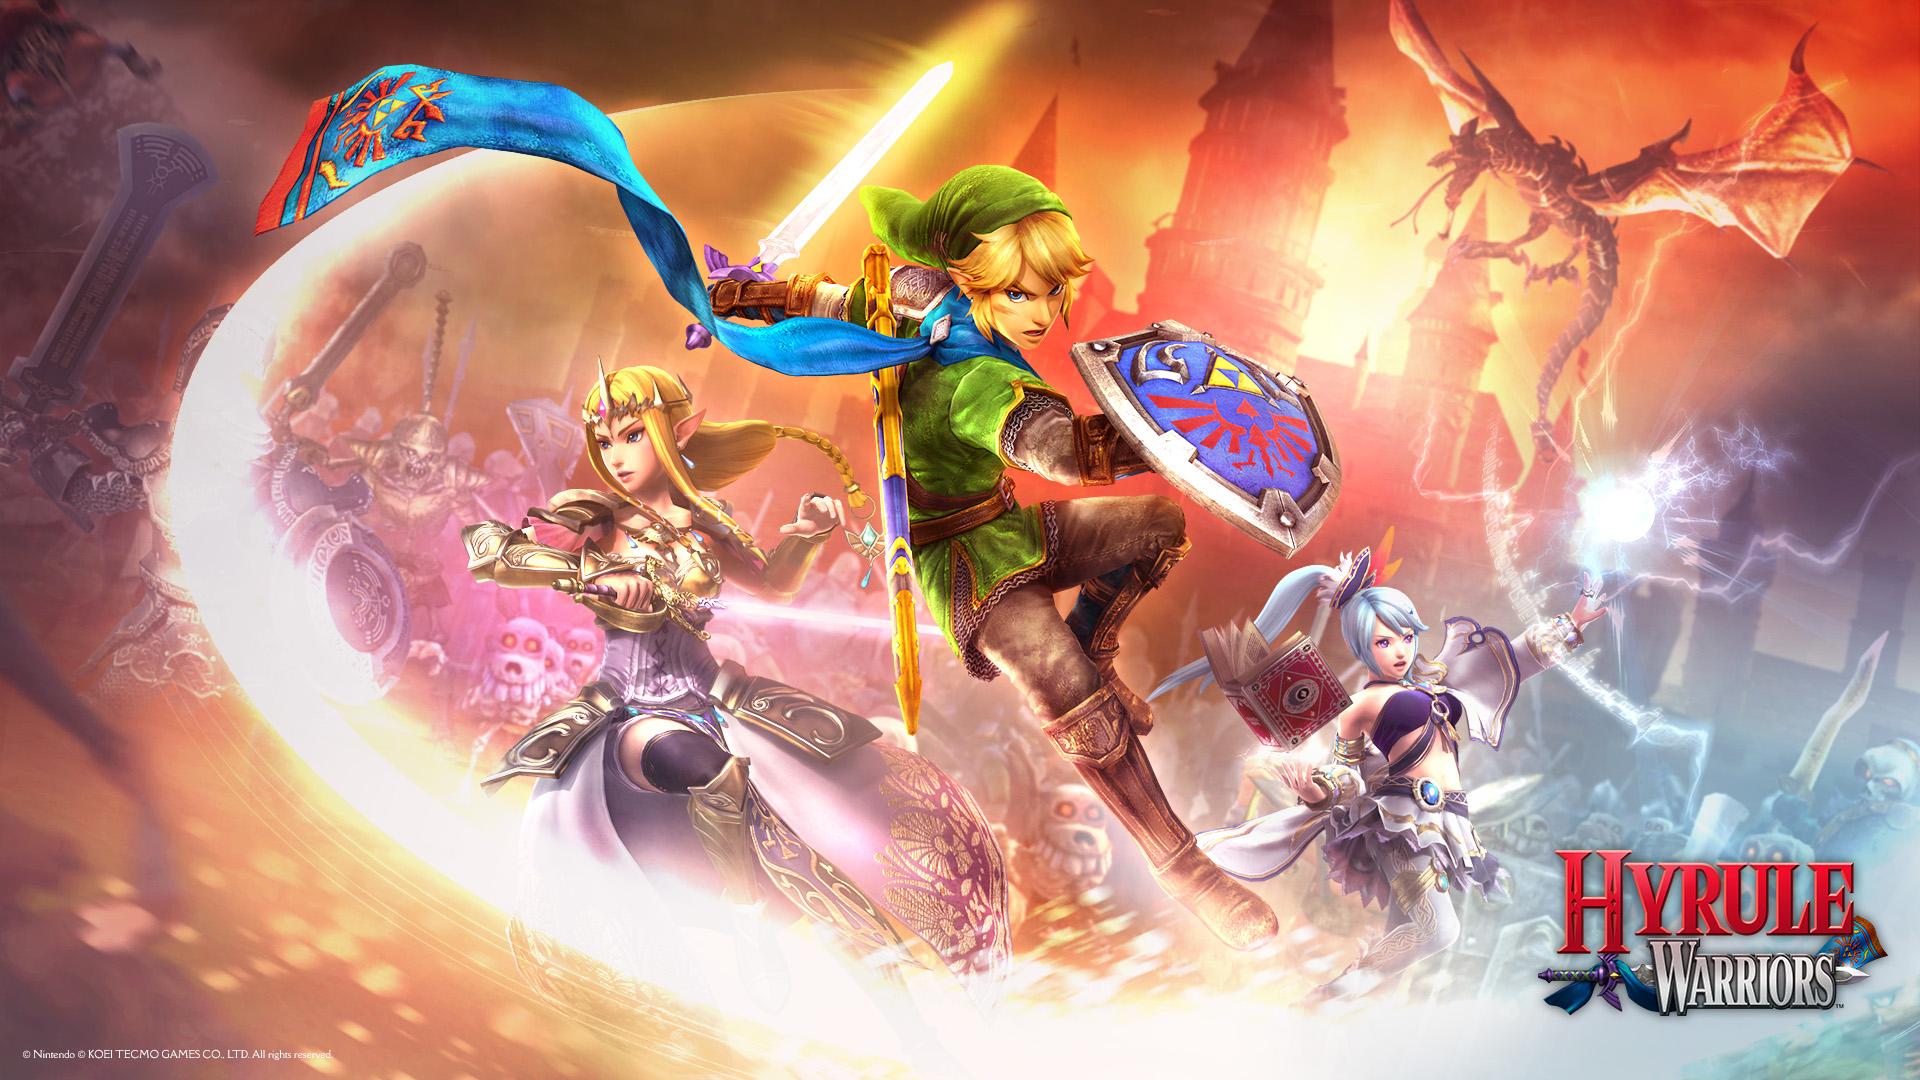 Revelados nuevos personajes y DLC de Hyrule Warriors Legends para 3DS